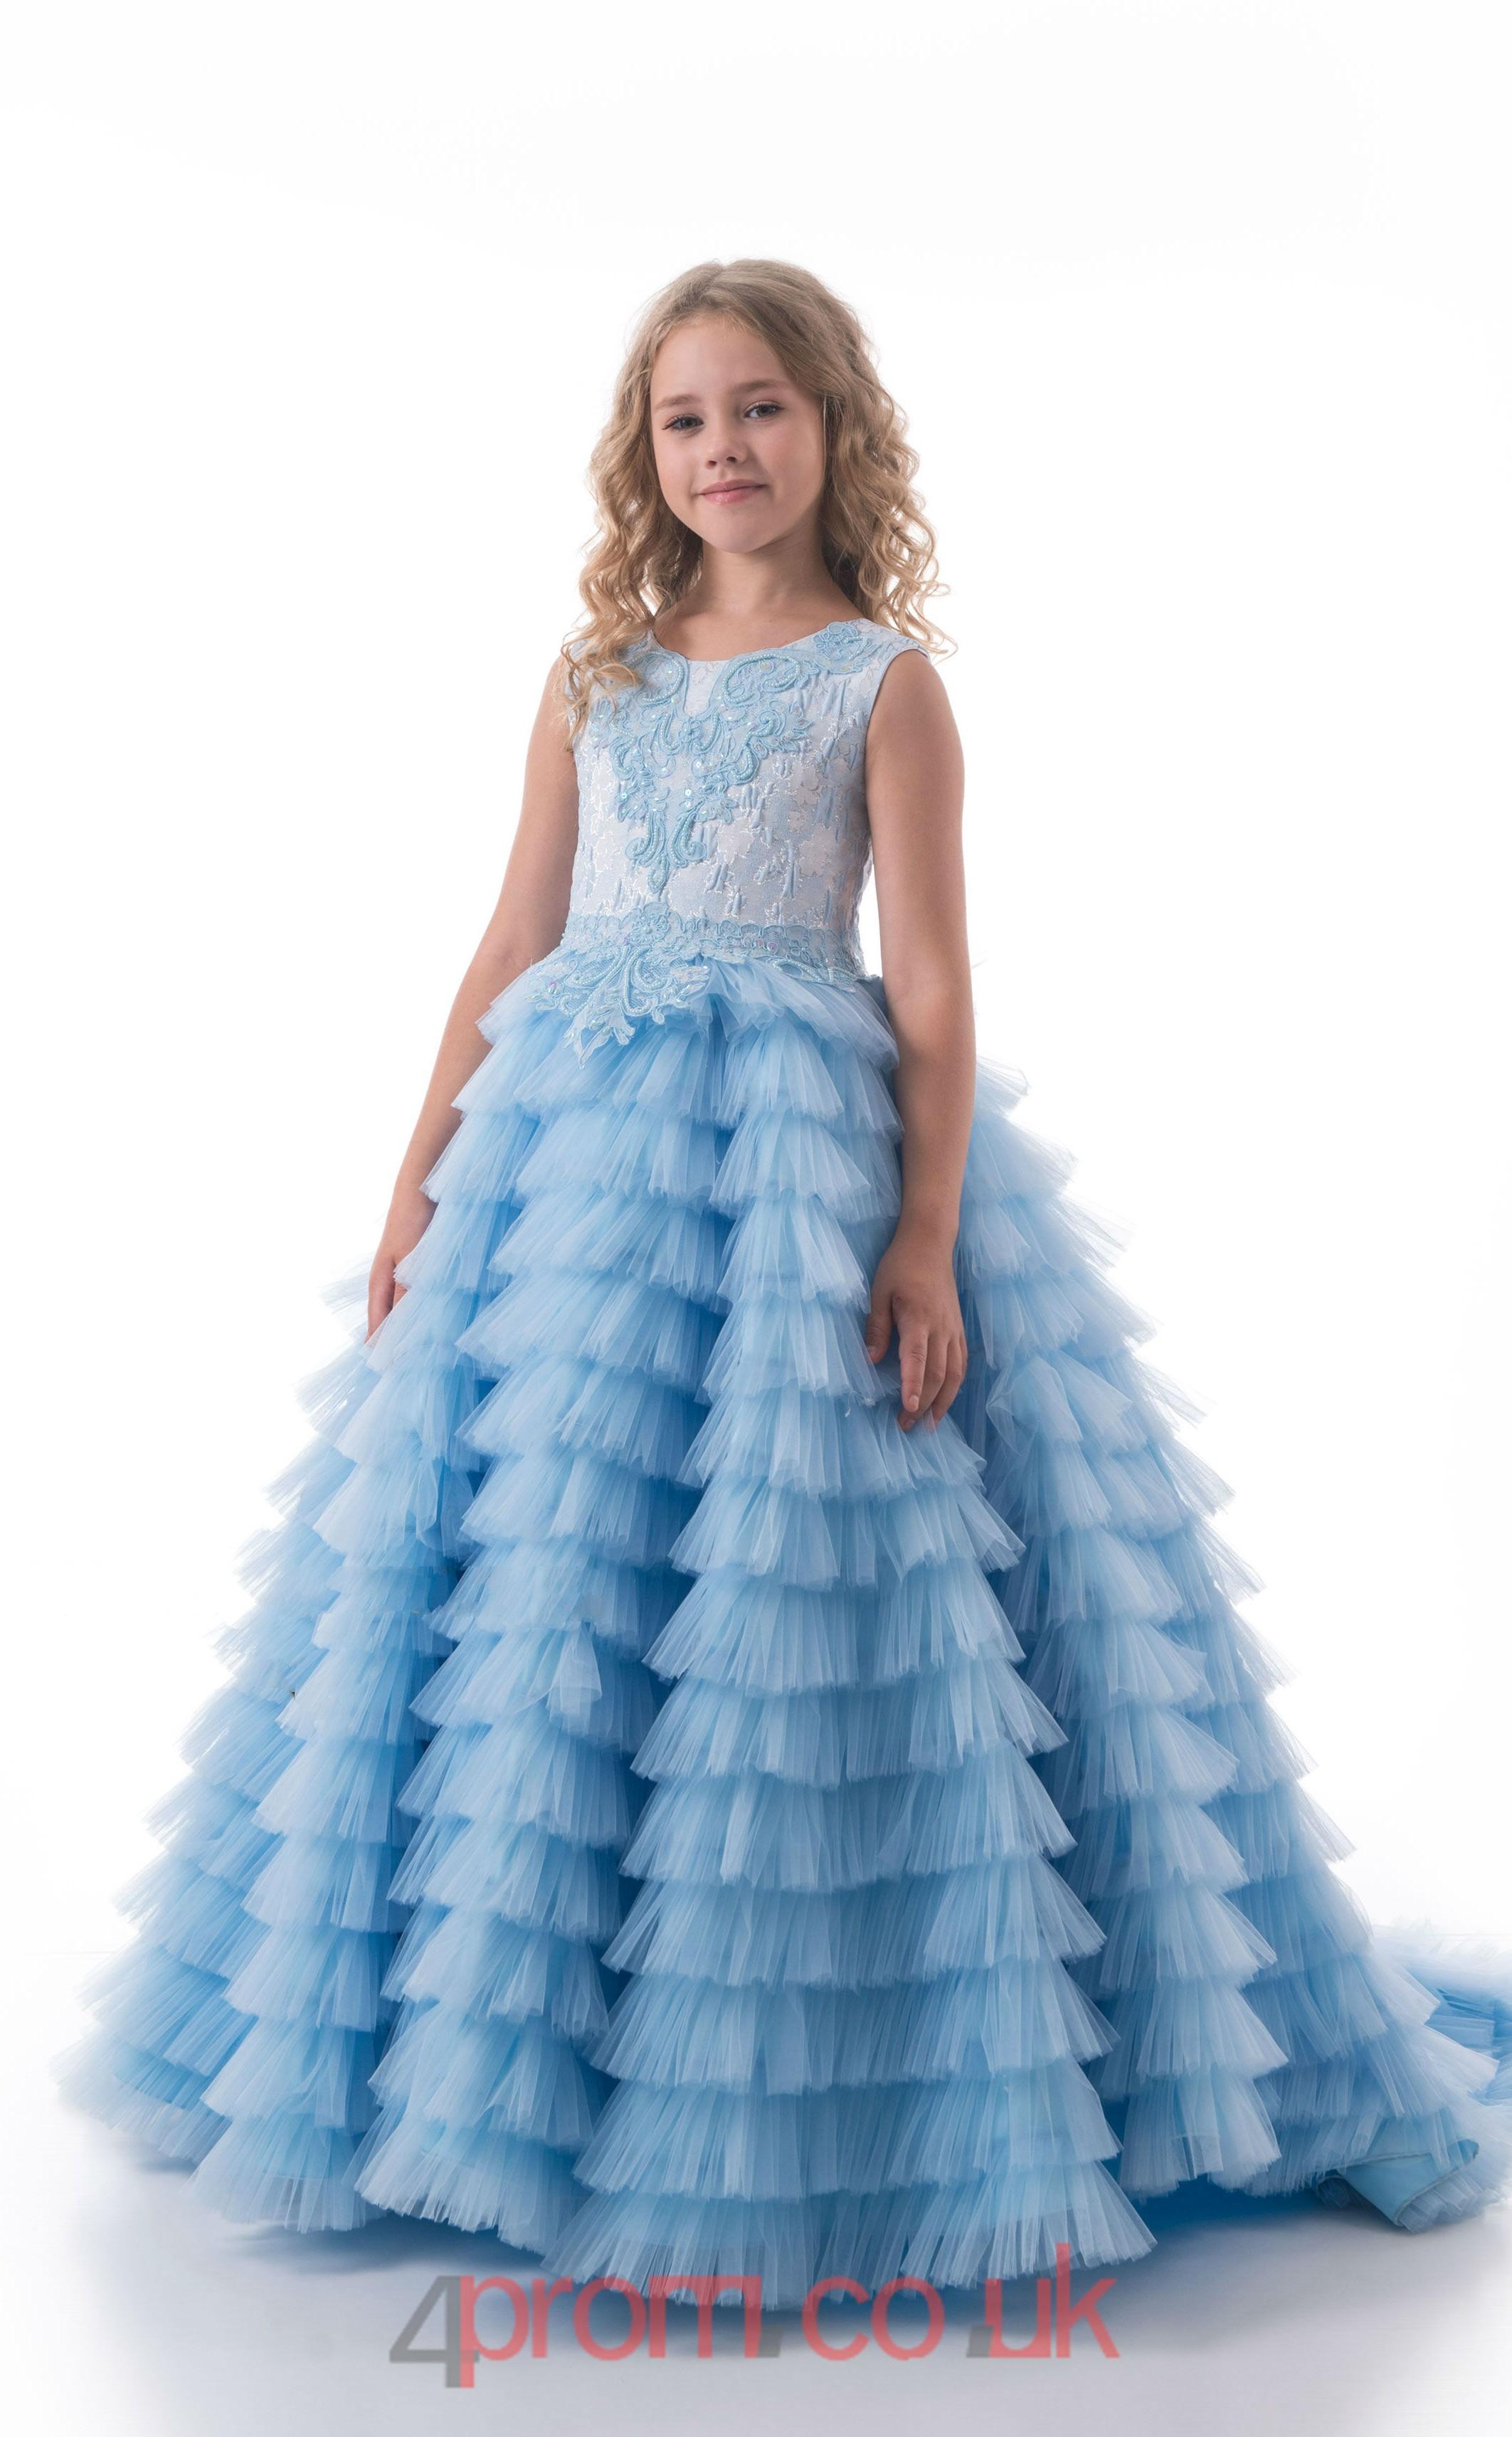 Colorful Kids Prom Dresses Uk Embellishment - Colorful Wedding Dress ...